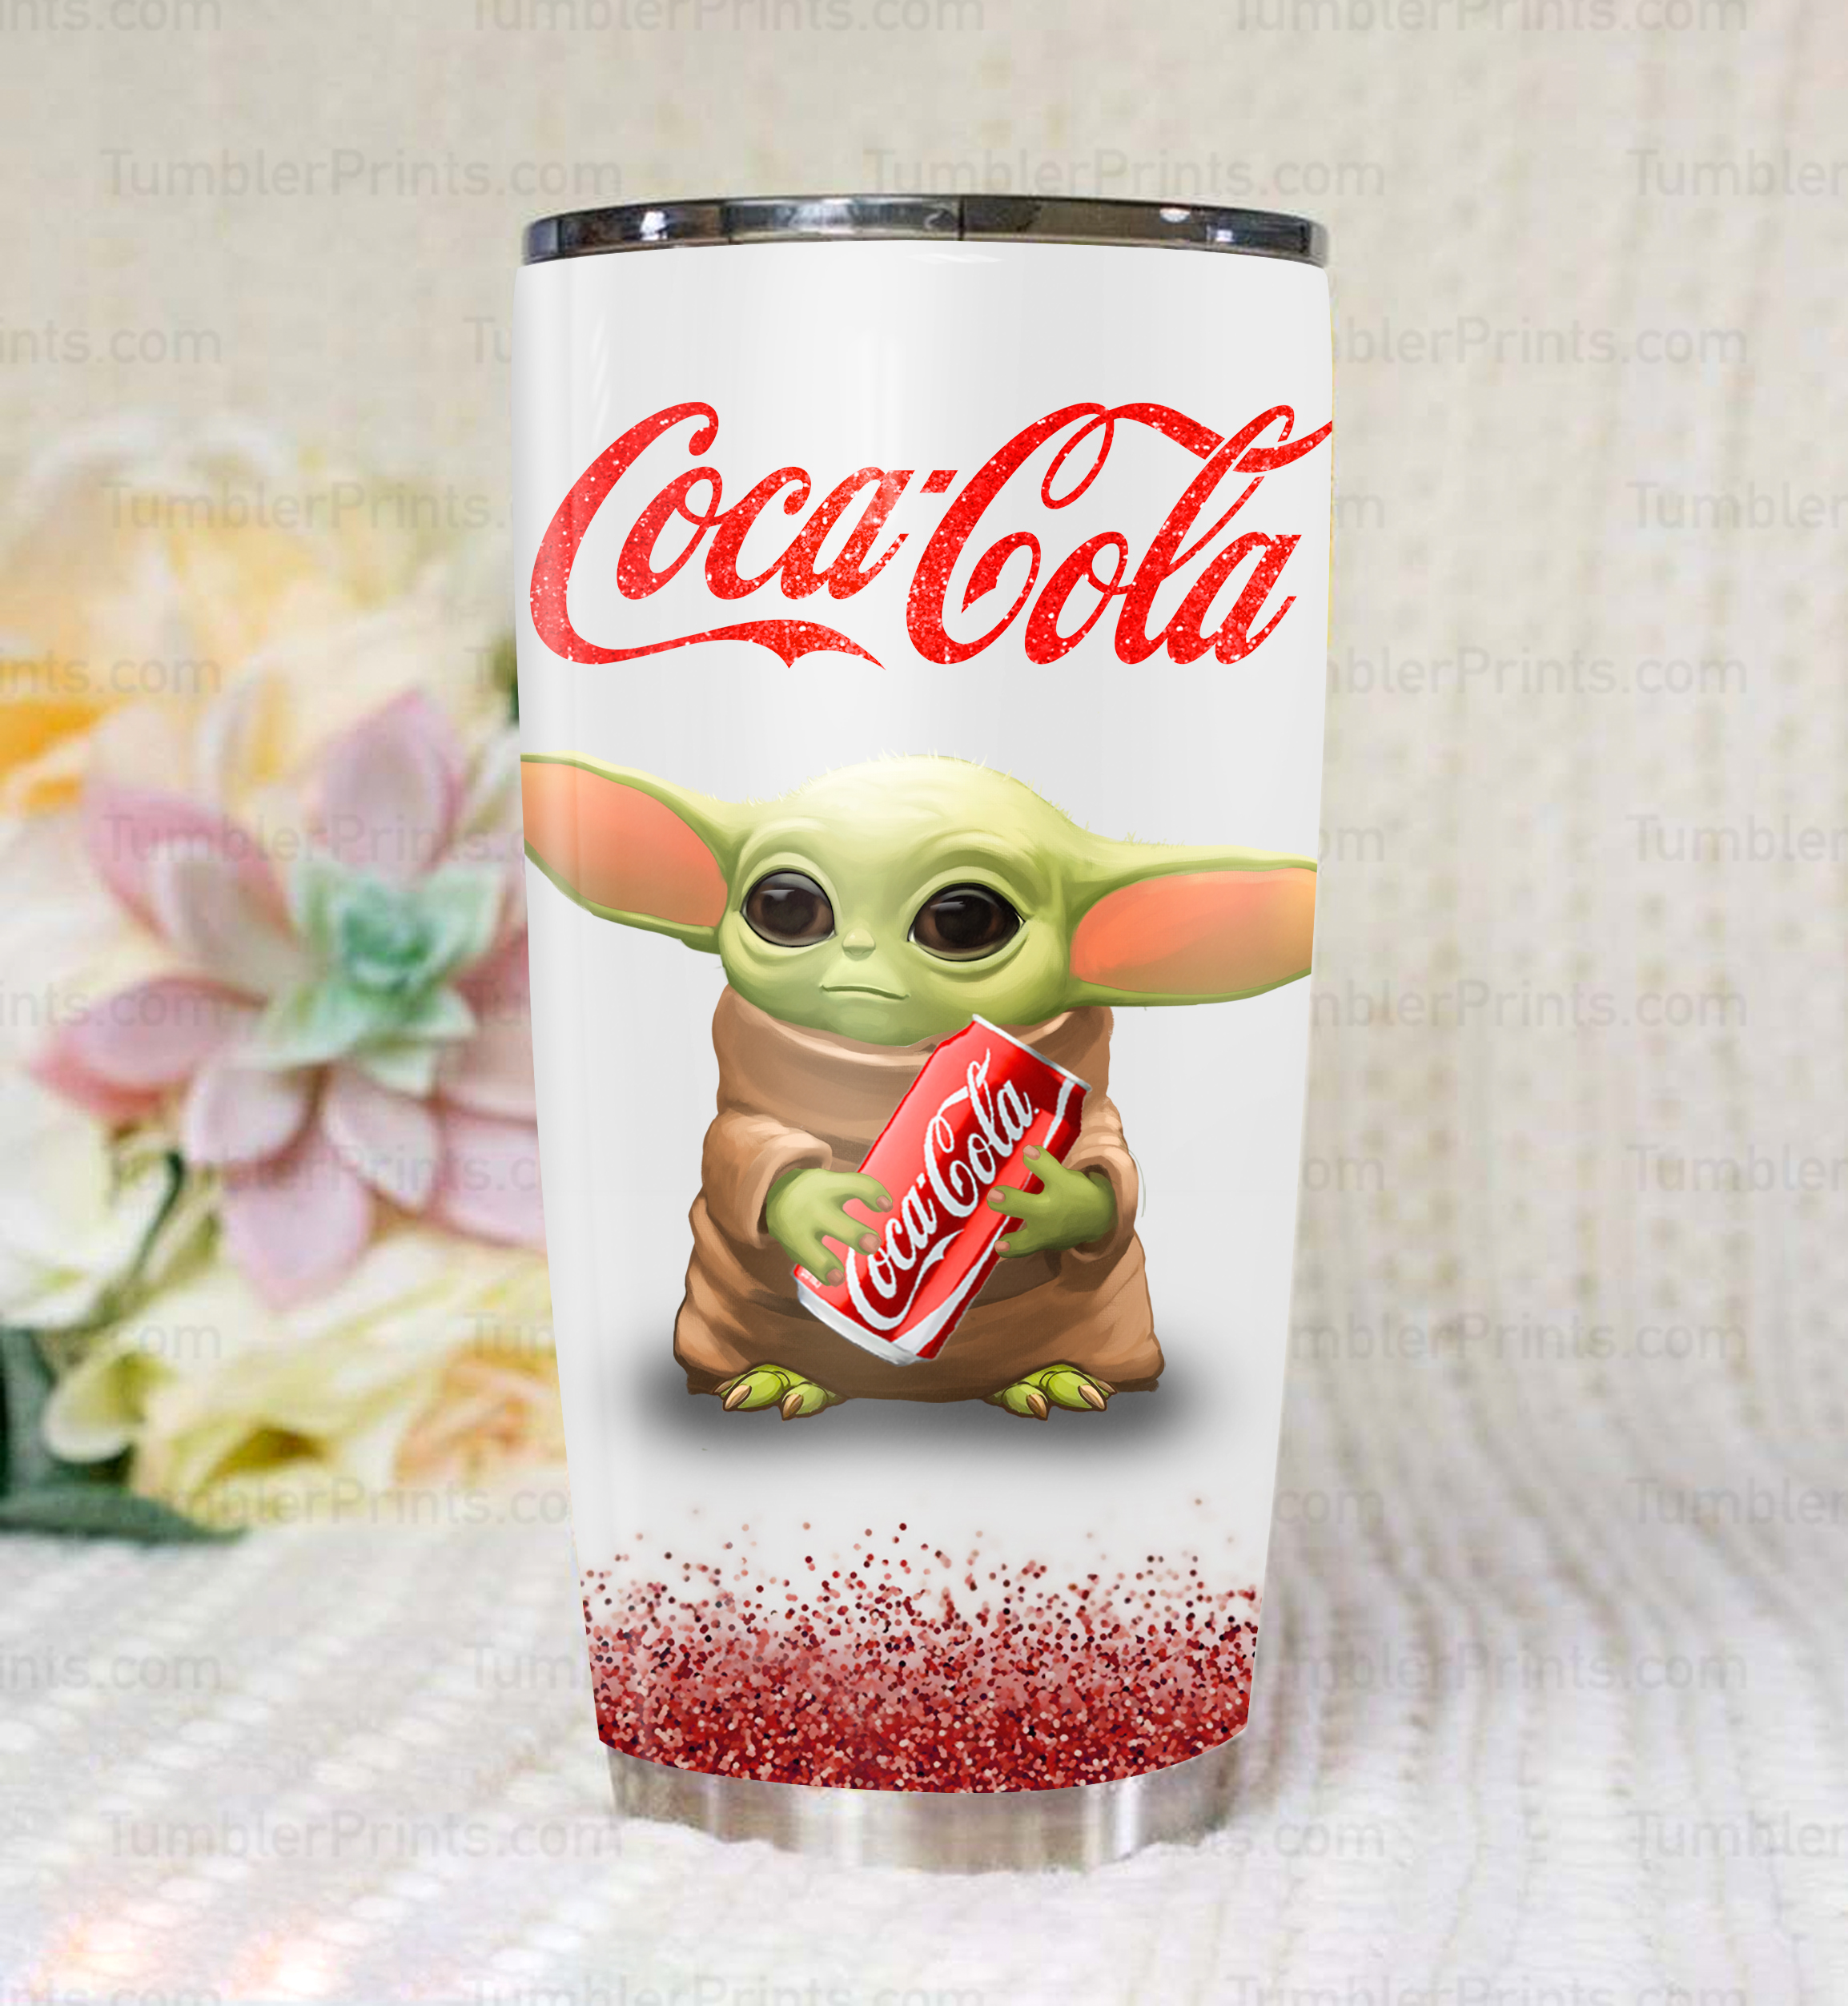 Baby yoda hold coca cola steel tumbler 4